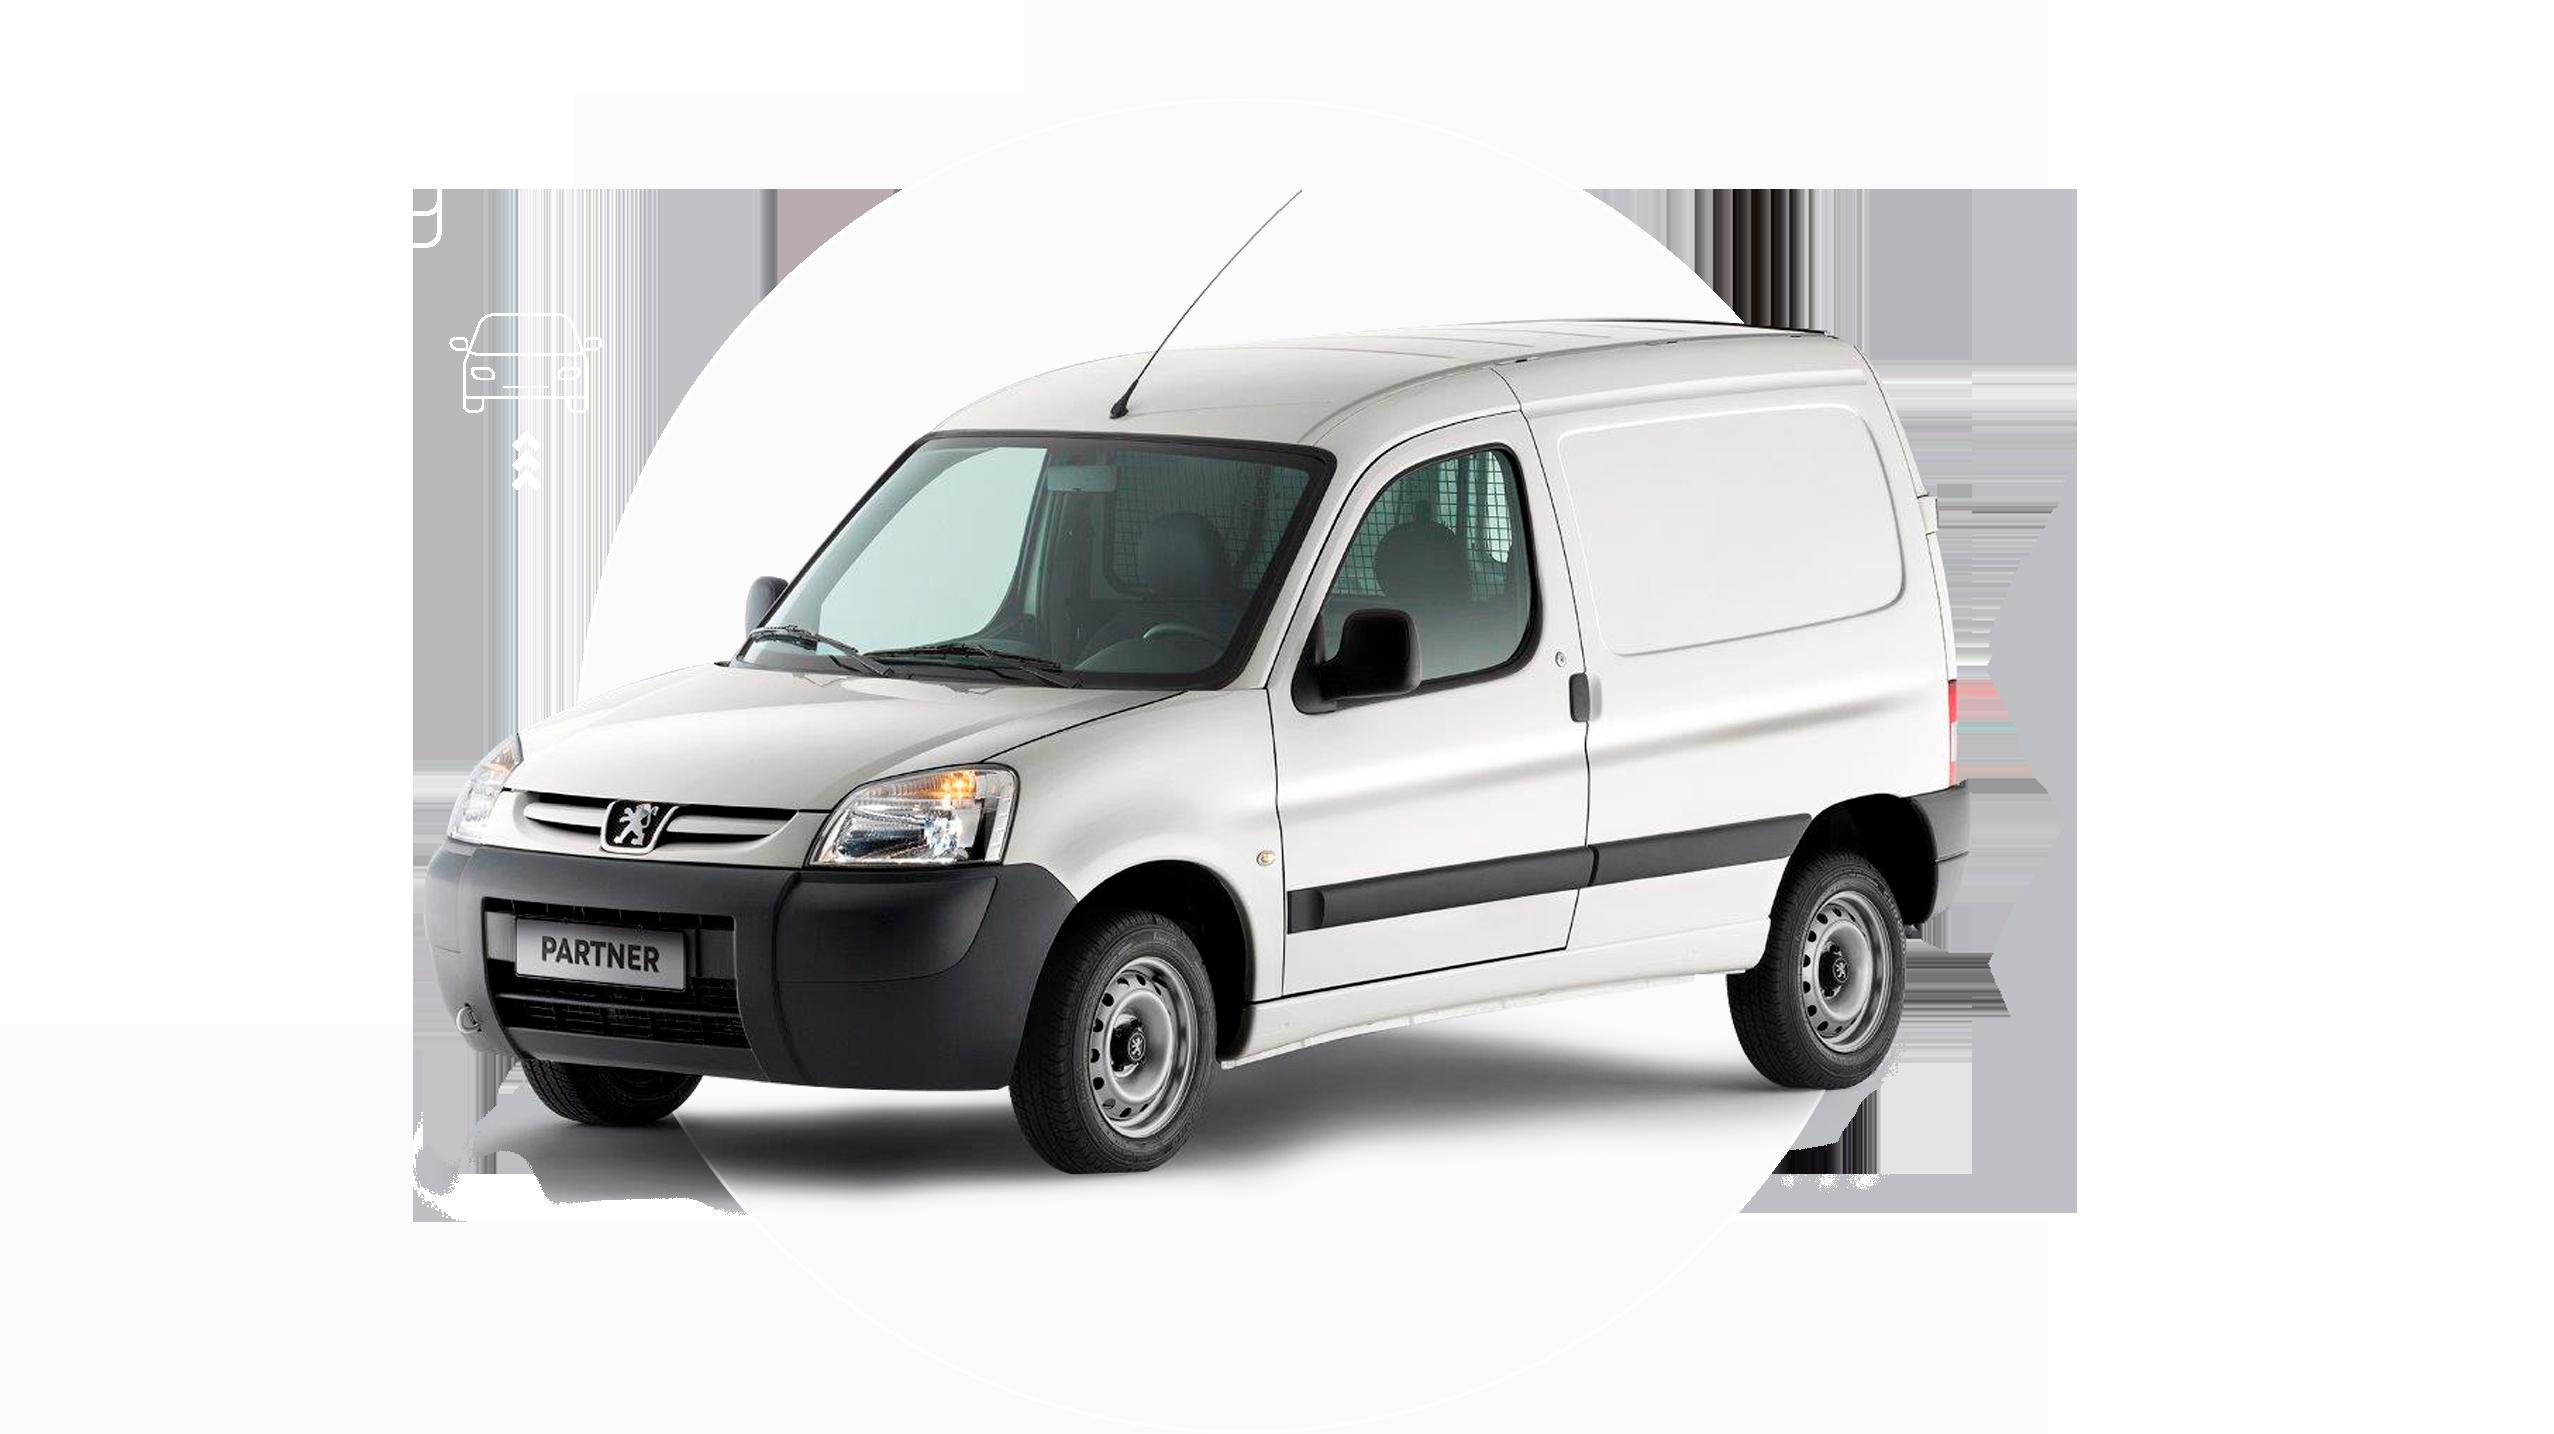 Consorcio Peugeot Partner